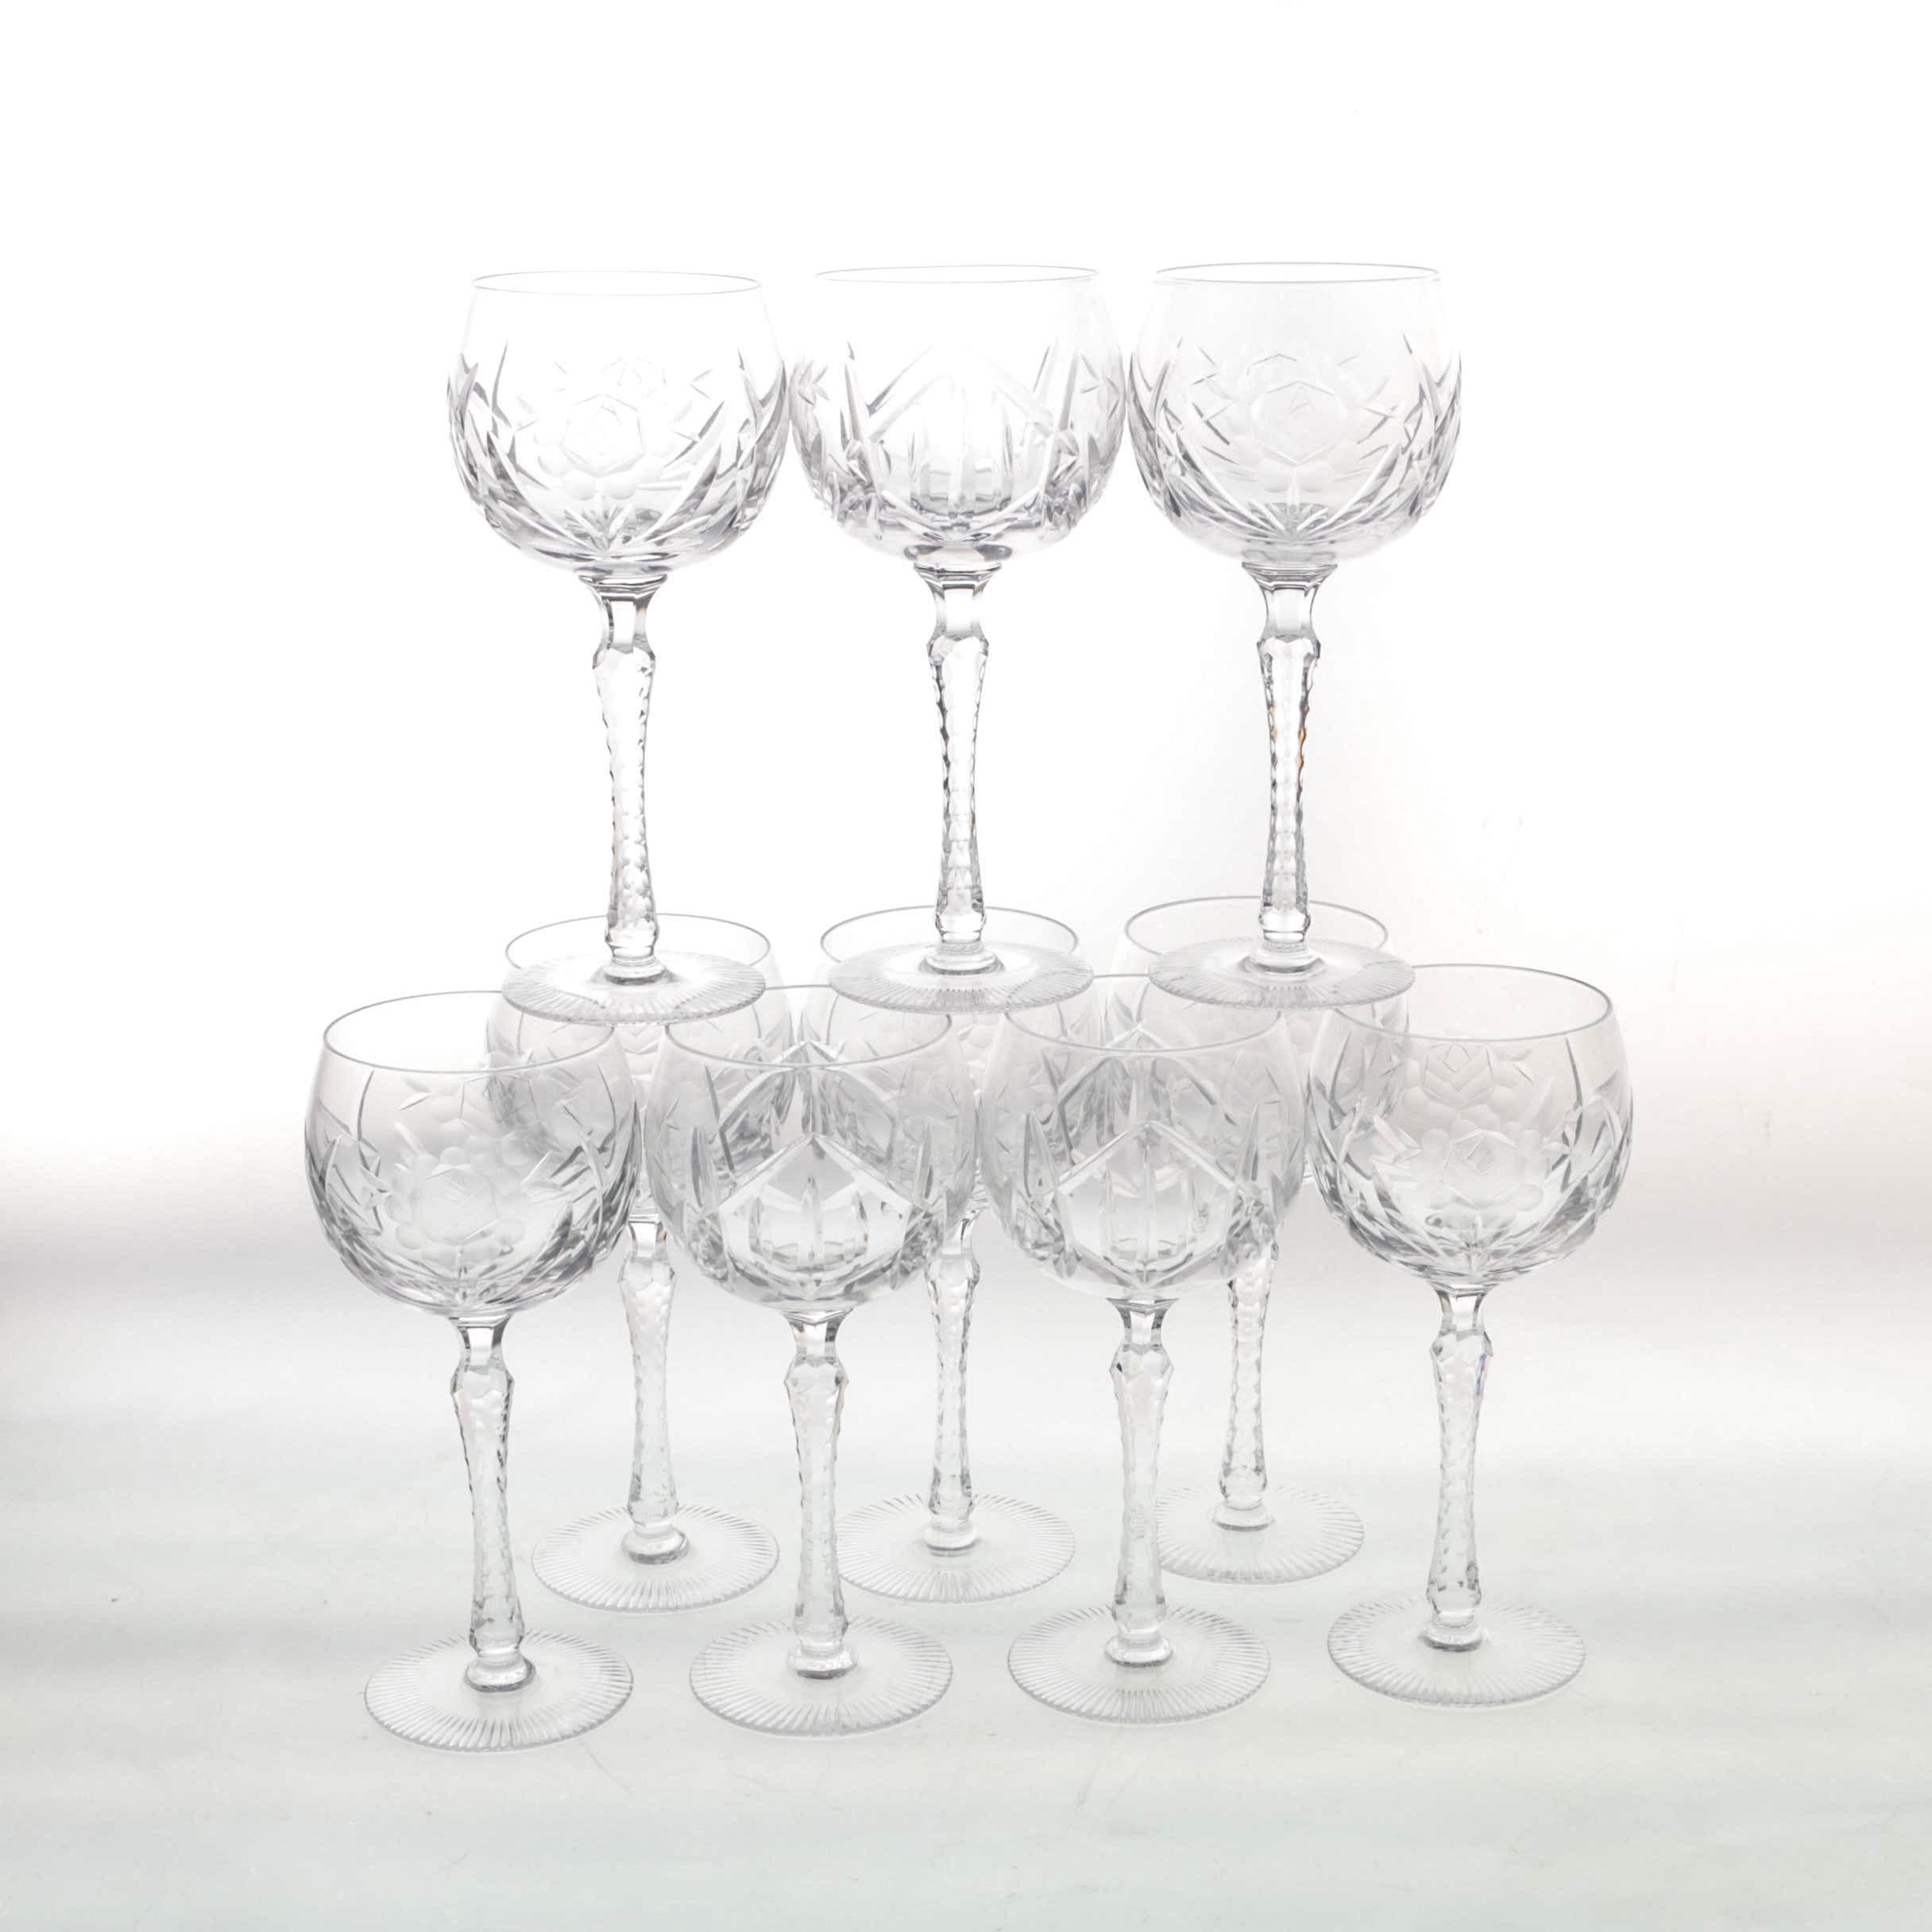 Hand-Cut Crystal Hock Wine Glasses